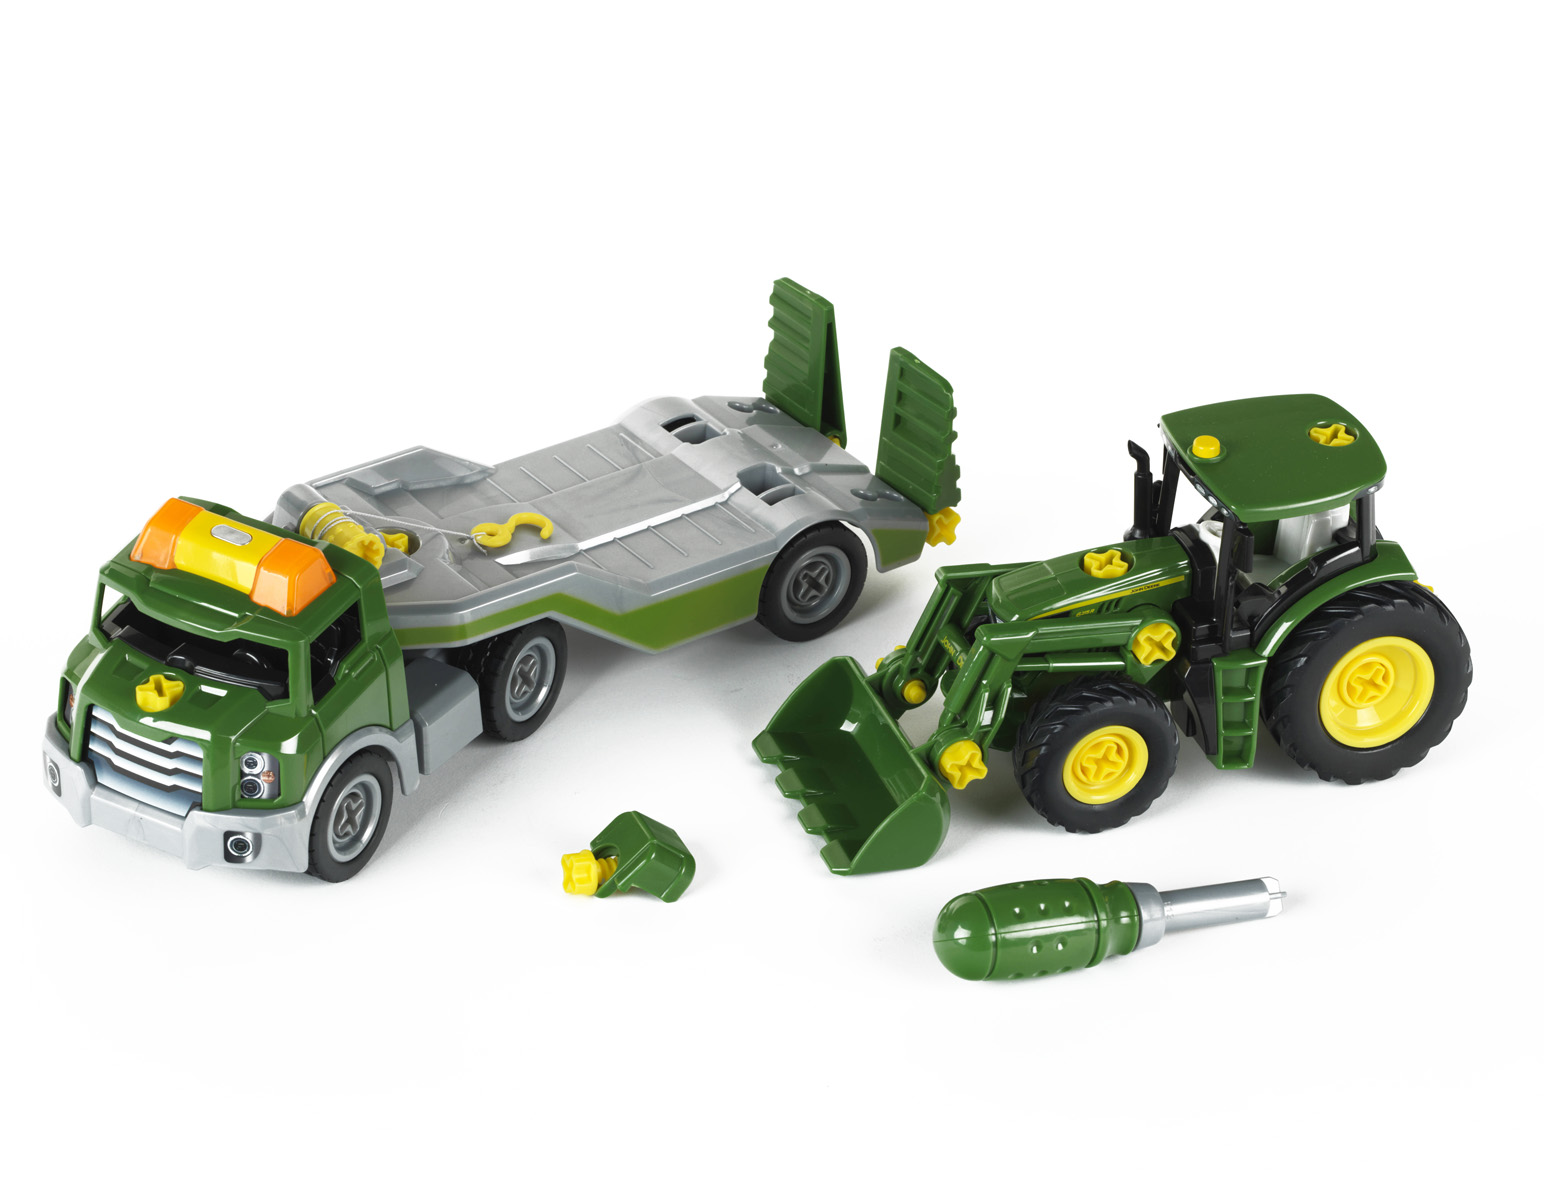 John Deere Tractor & Transporter by Theo klein